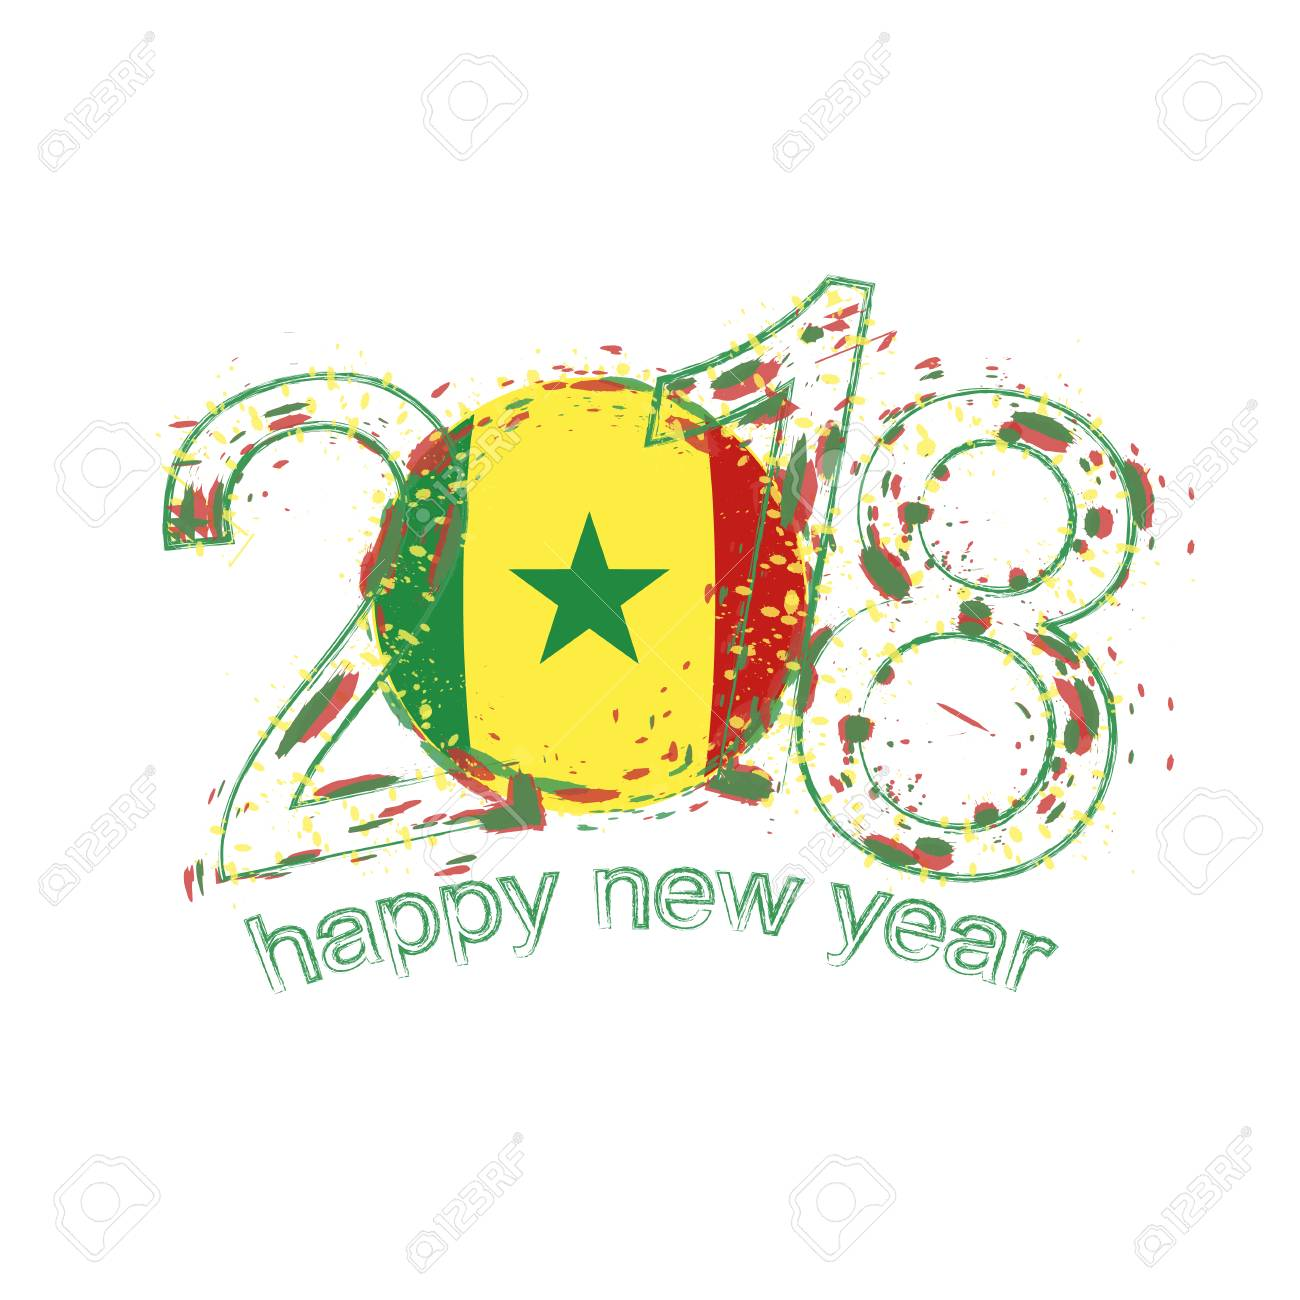 2018 happy new year senegal grunge vector template for greeting 2018 happy new year senegal grunge vector template for greeting card calendars 2018 seasonal m4hsunfo